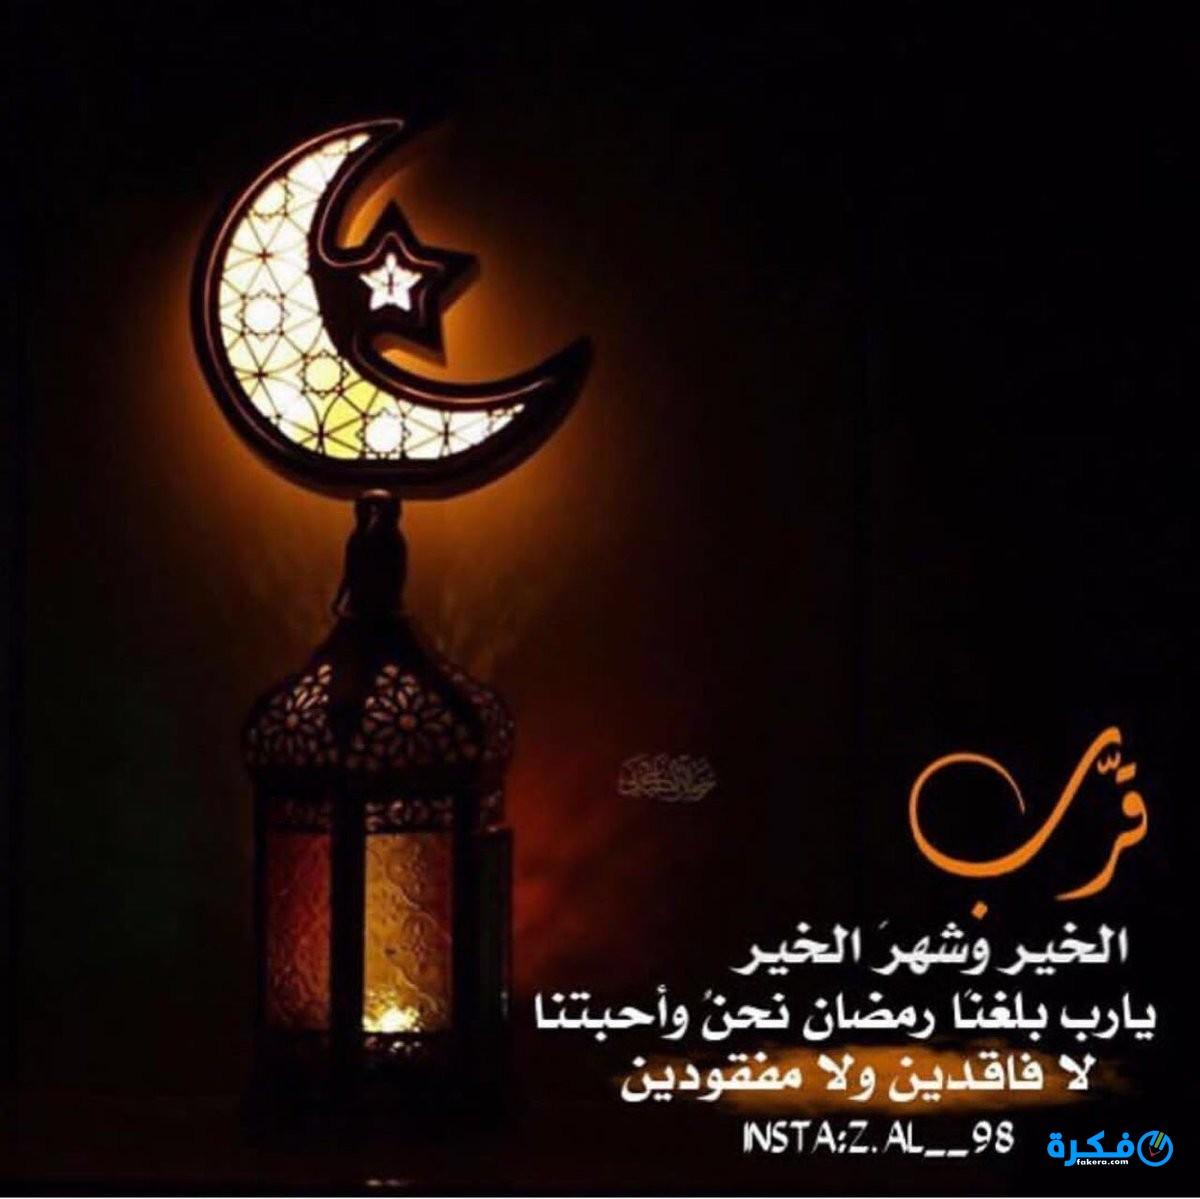 صور اهلا رمضان 2019 D4Rn_L6WkAAPTjt.jpg